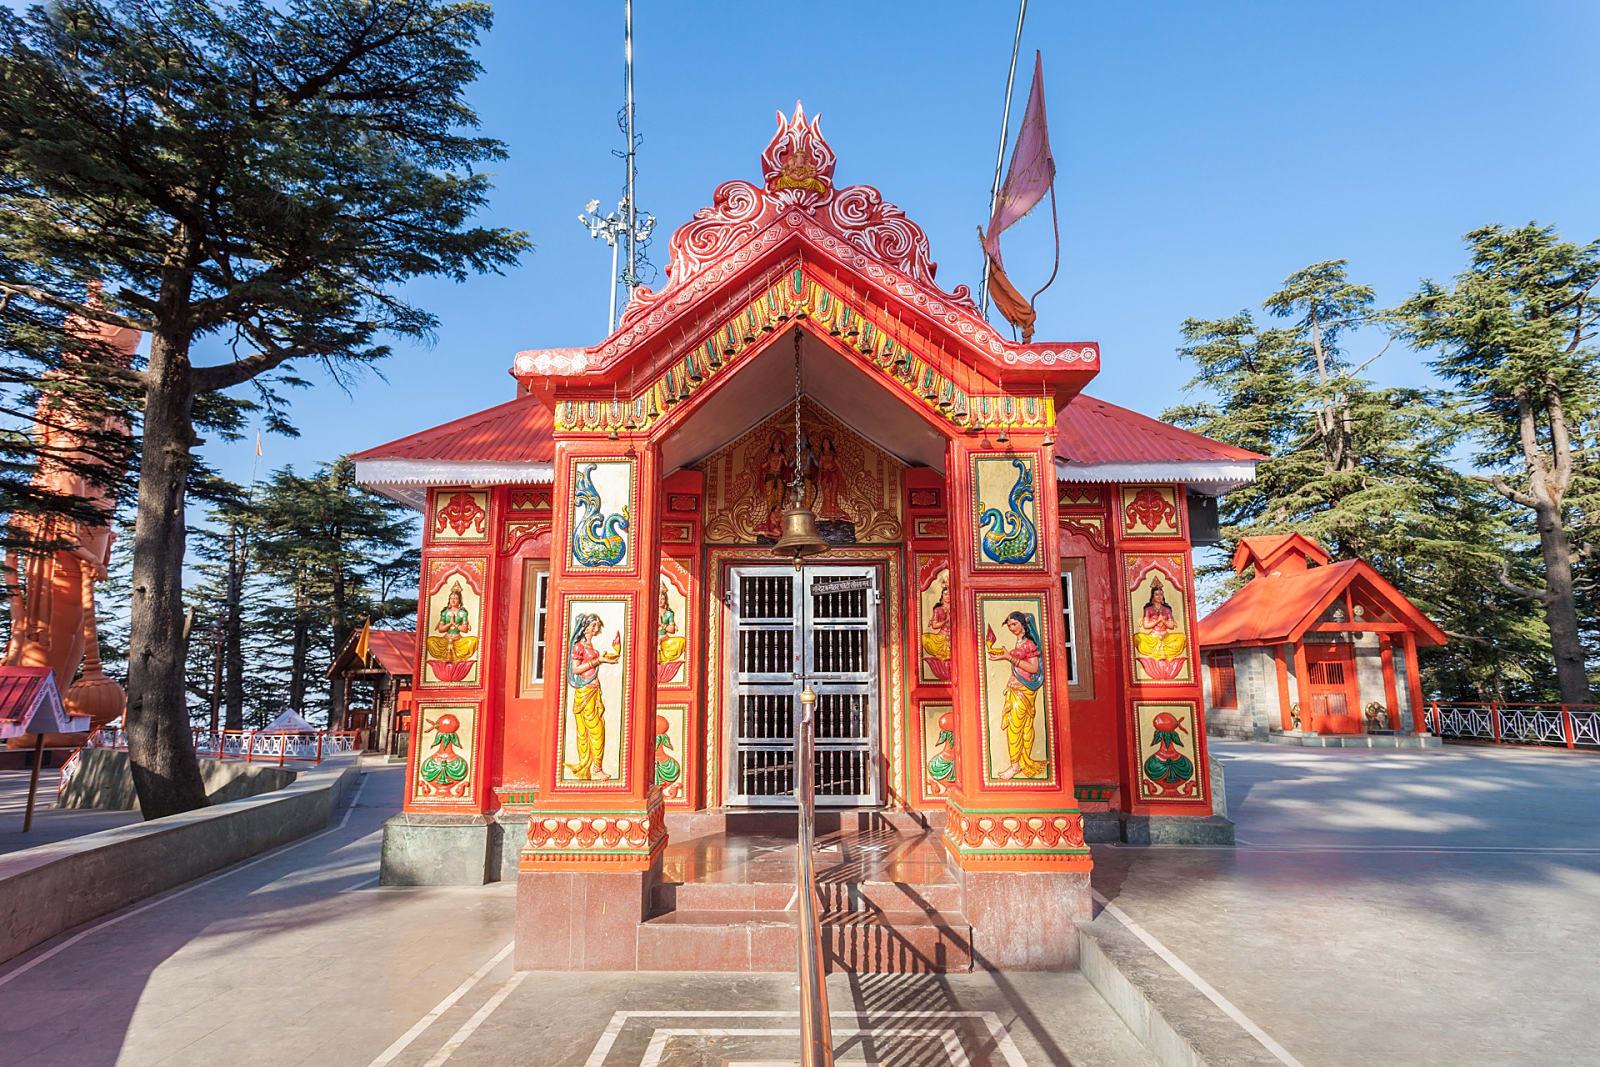 shimla-jakhoo-temple-147613917722-orijgp.jpg